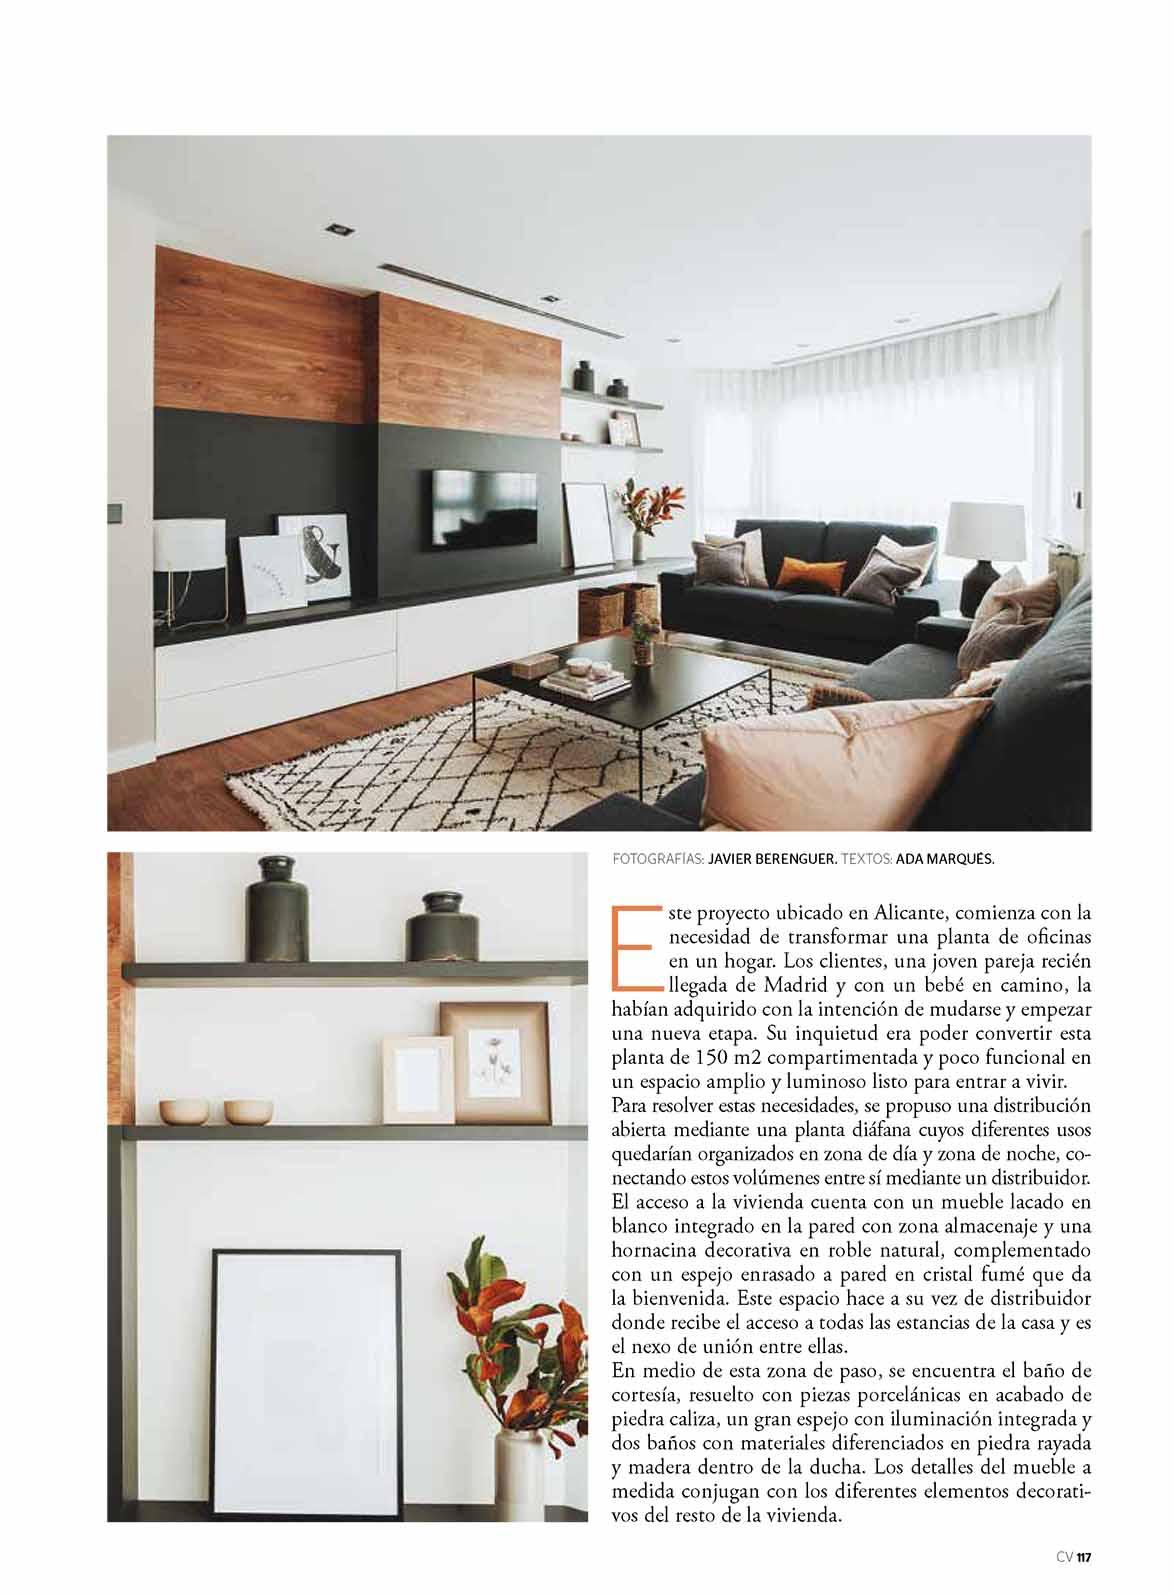 Fotografos de Interiorismo Murcia